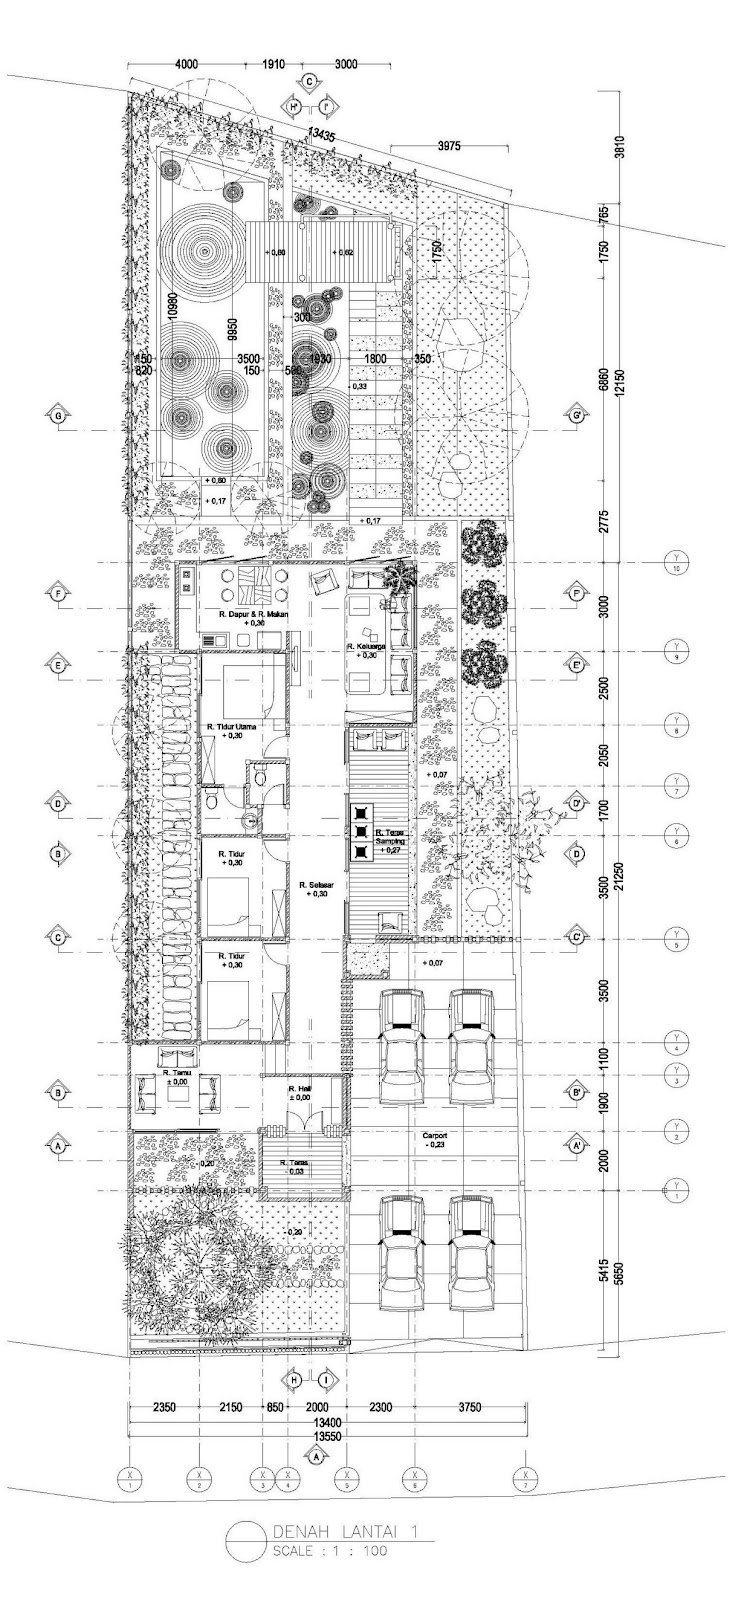 Image Result For Desain Partisi Ruang